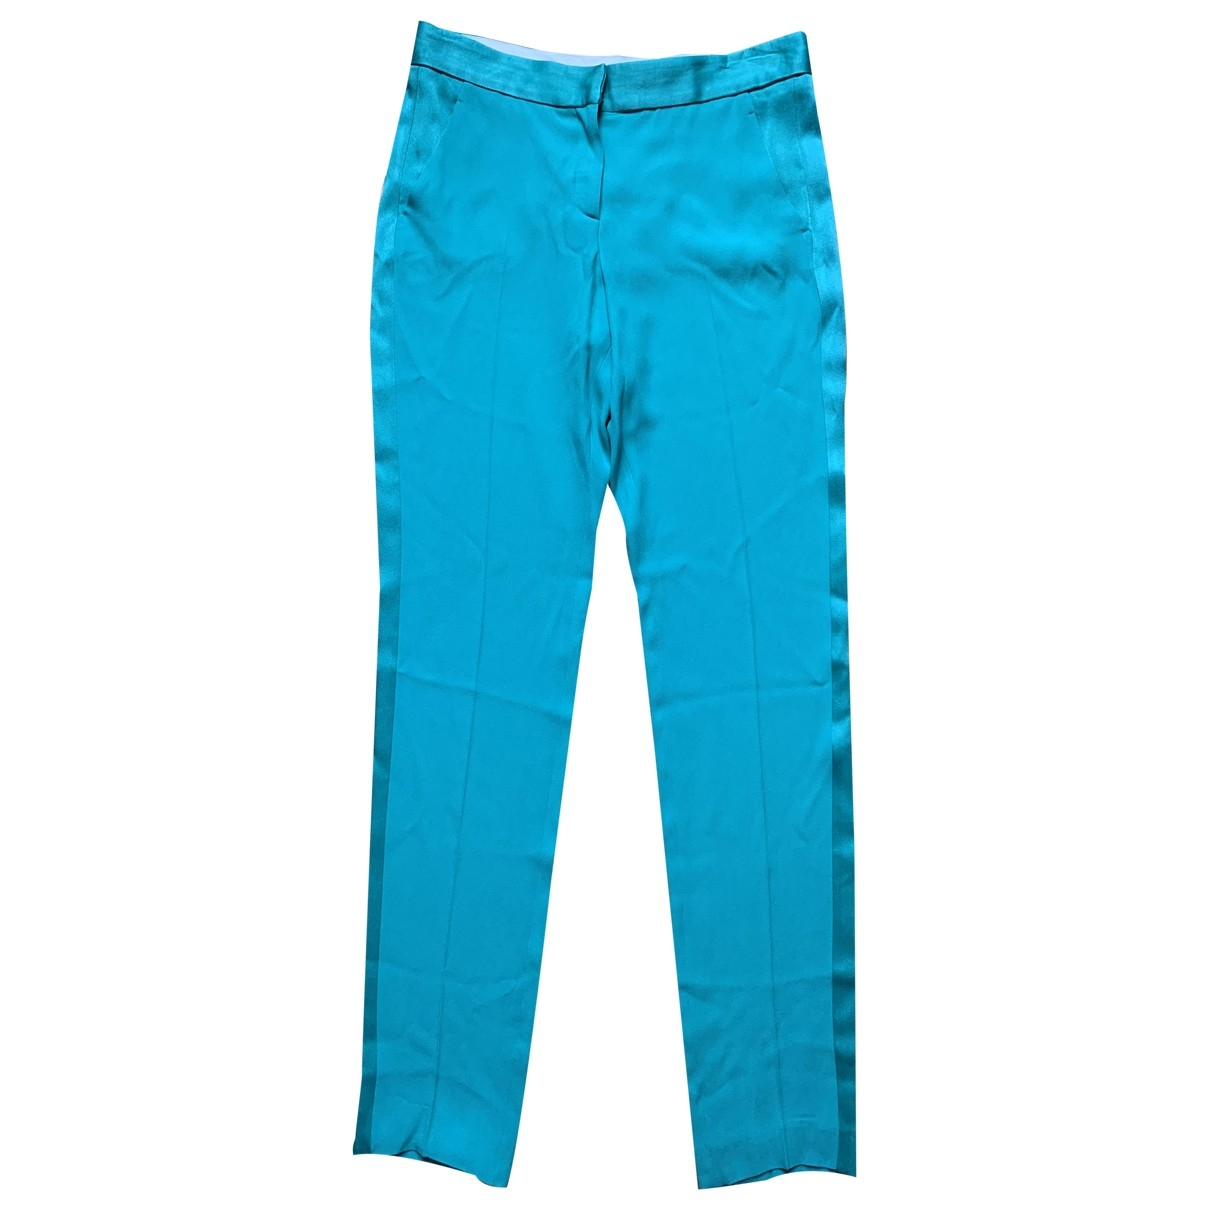 Tara Jarmon \N Green Trousers for Women S International